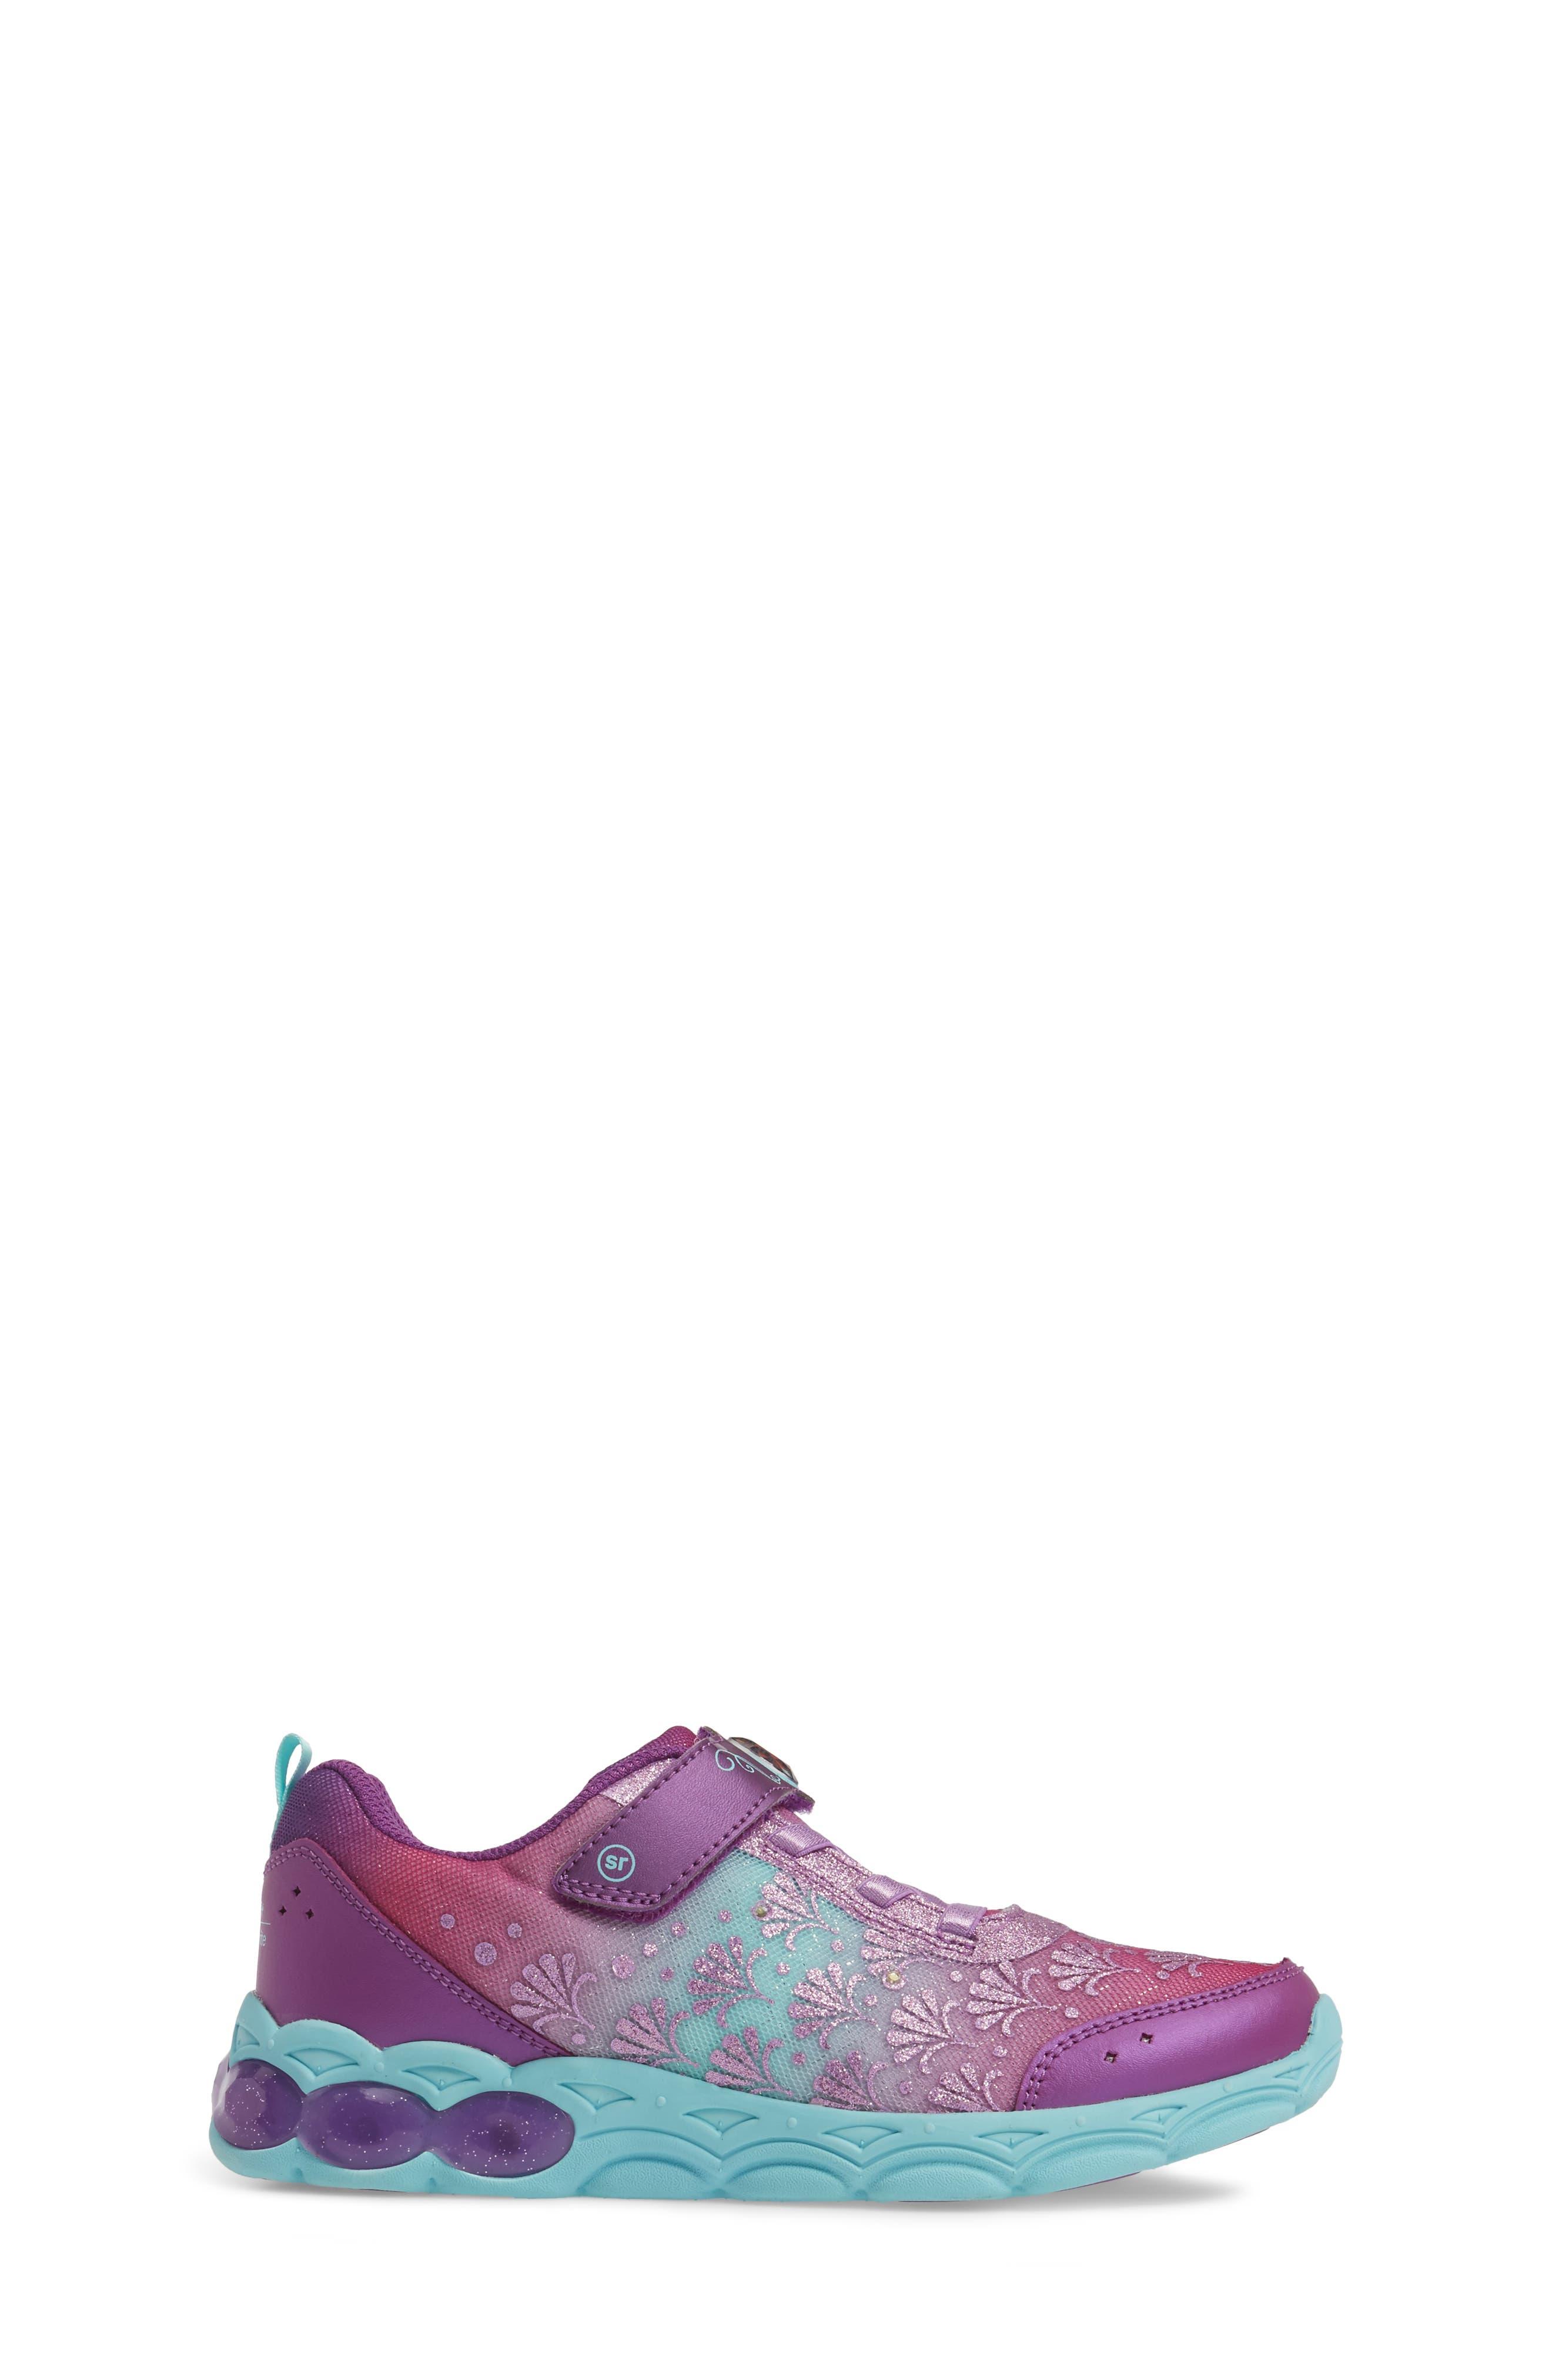 Disney<sup>®</sup> Ariel Ocean Adventurer Light-Up Sneaker,                             Alternate thumbnail 3, color,                             650